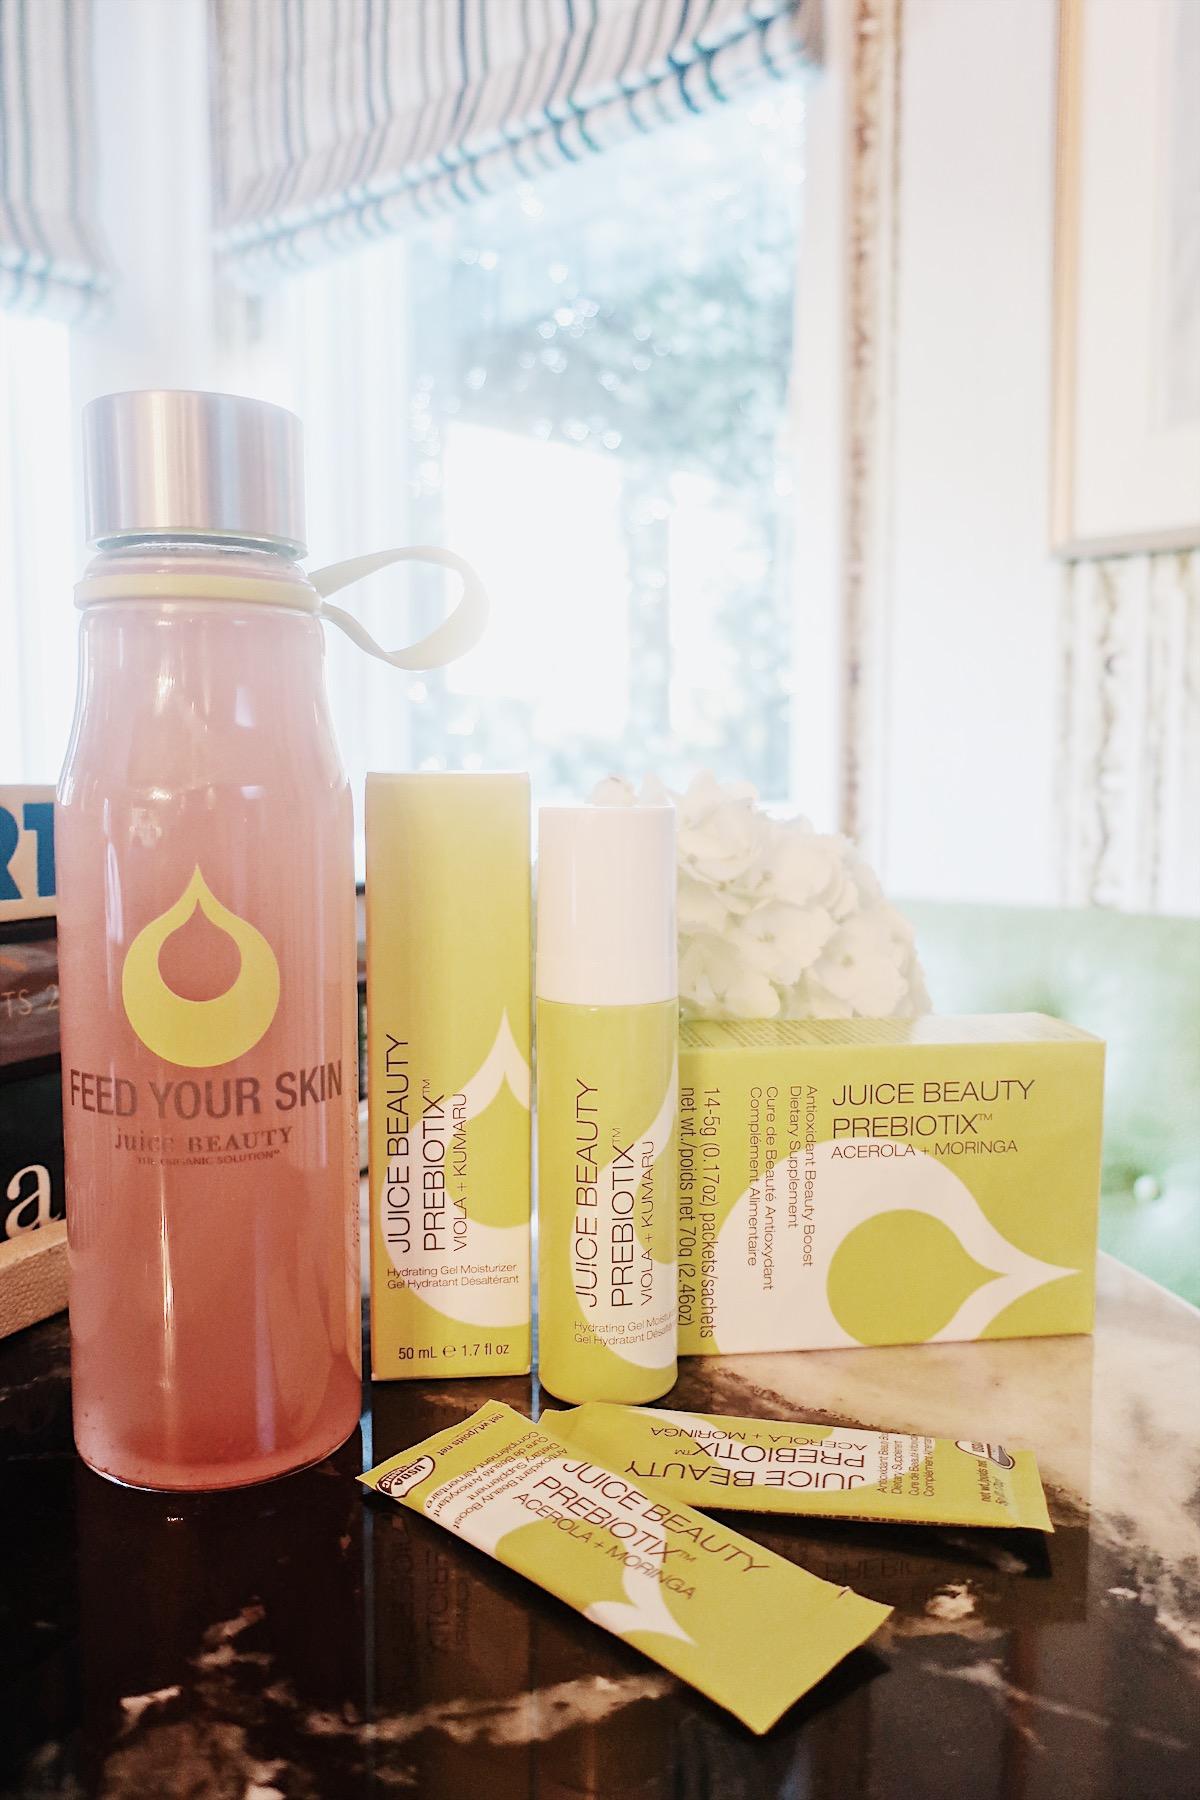 PREBIOTIX Hydrating Gel Moisturizer and PREBIOTIX Antioxidant Beauty Boost Supplement